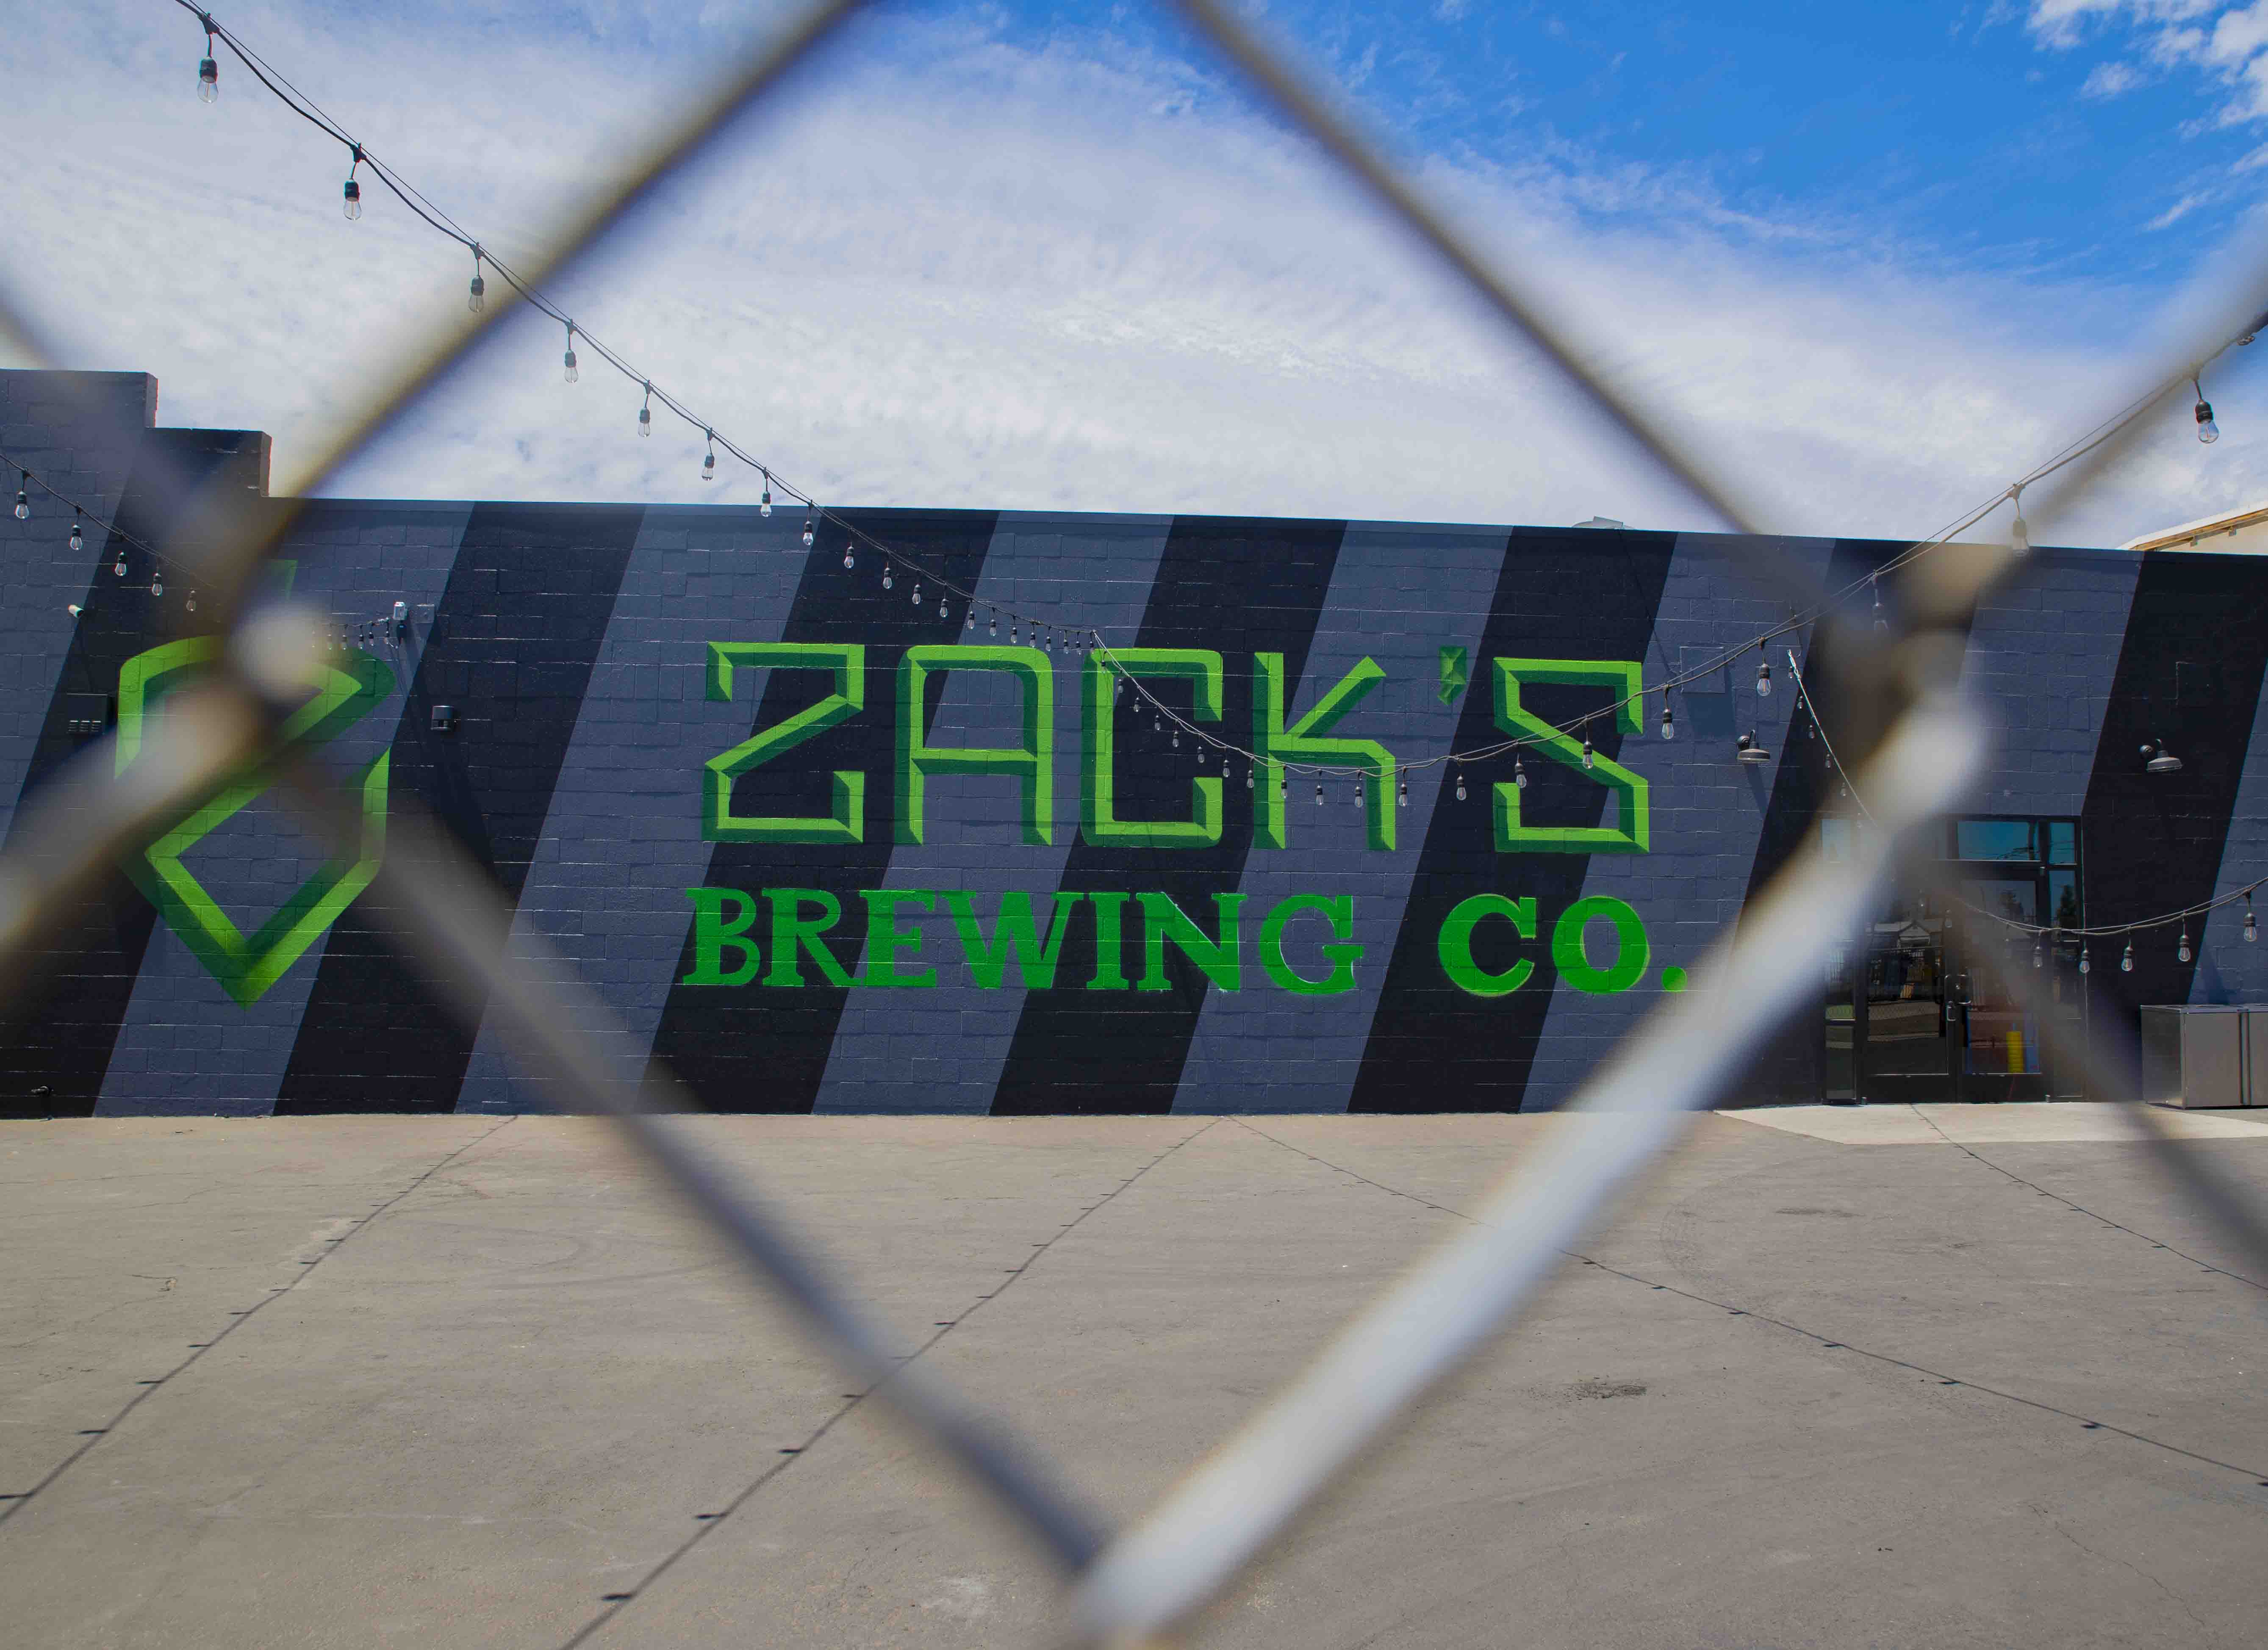 Zack's Brewing Company